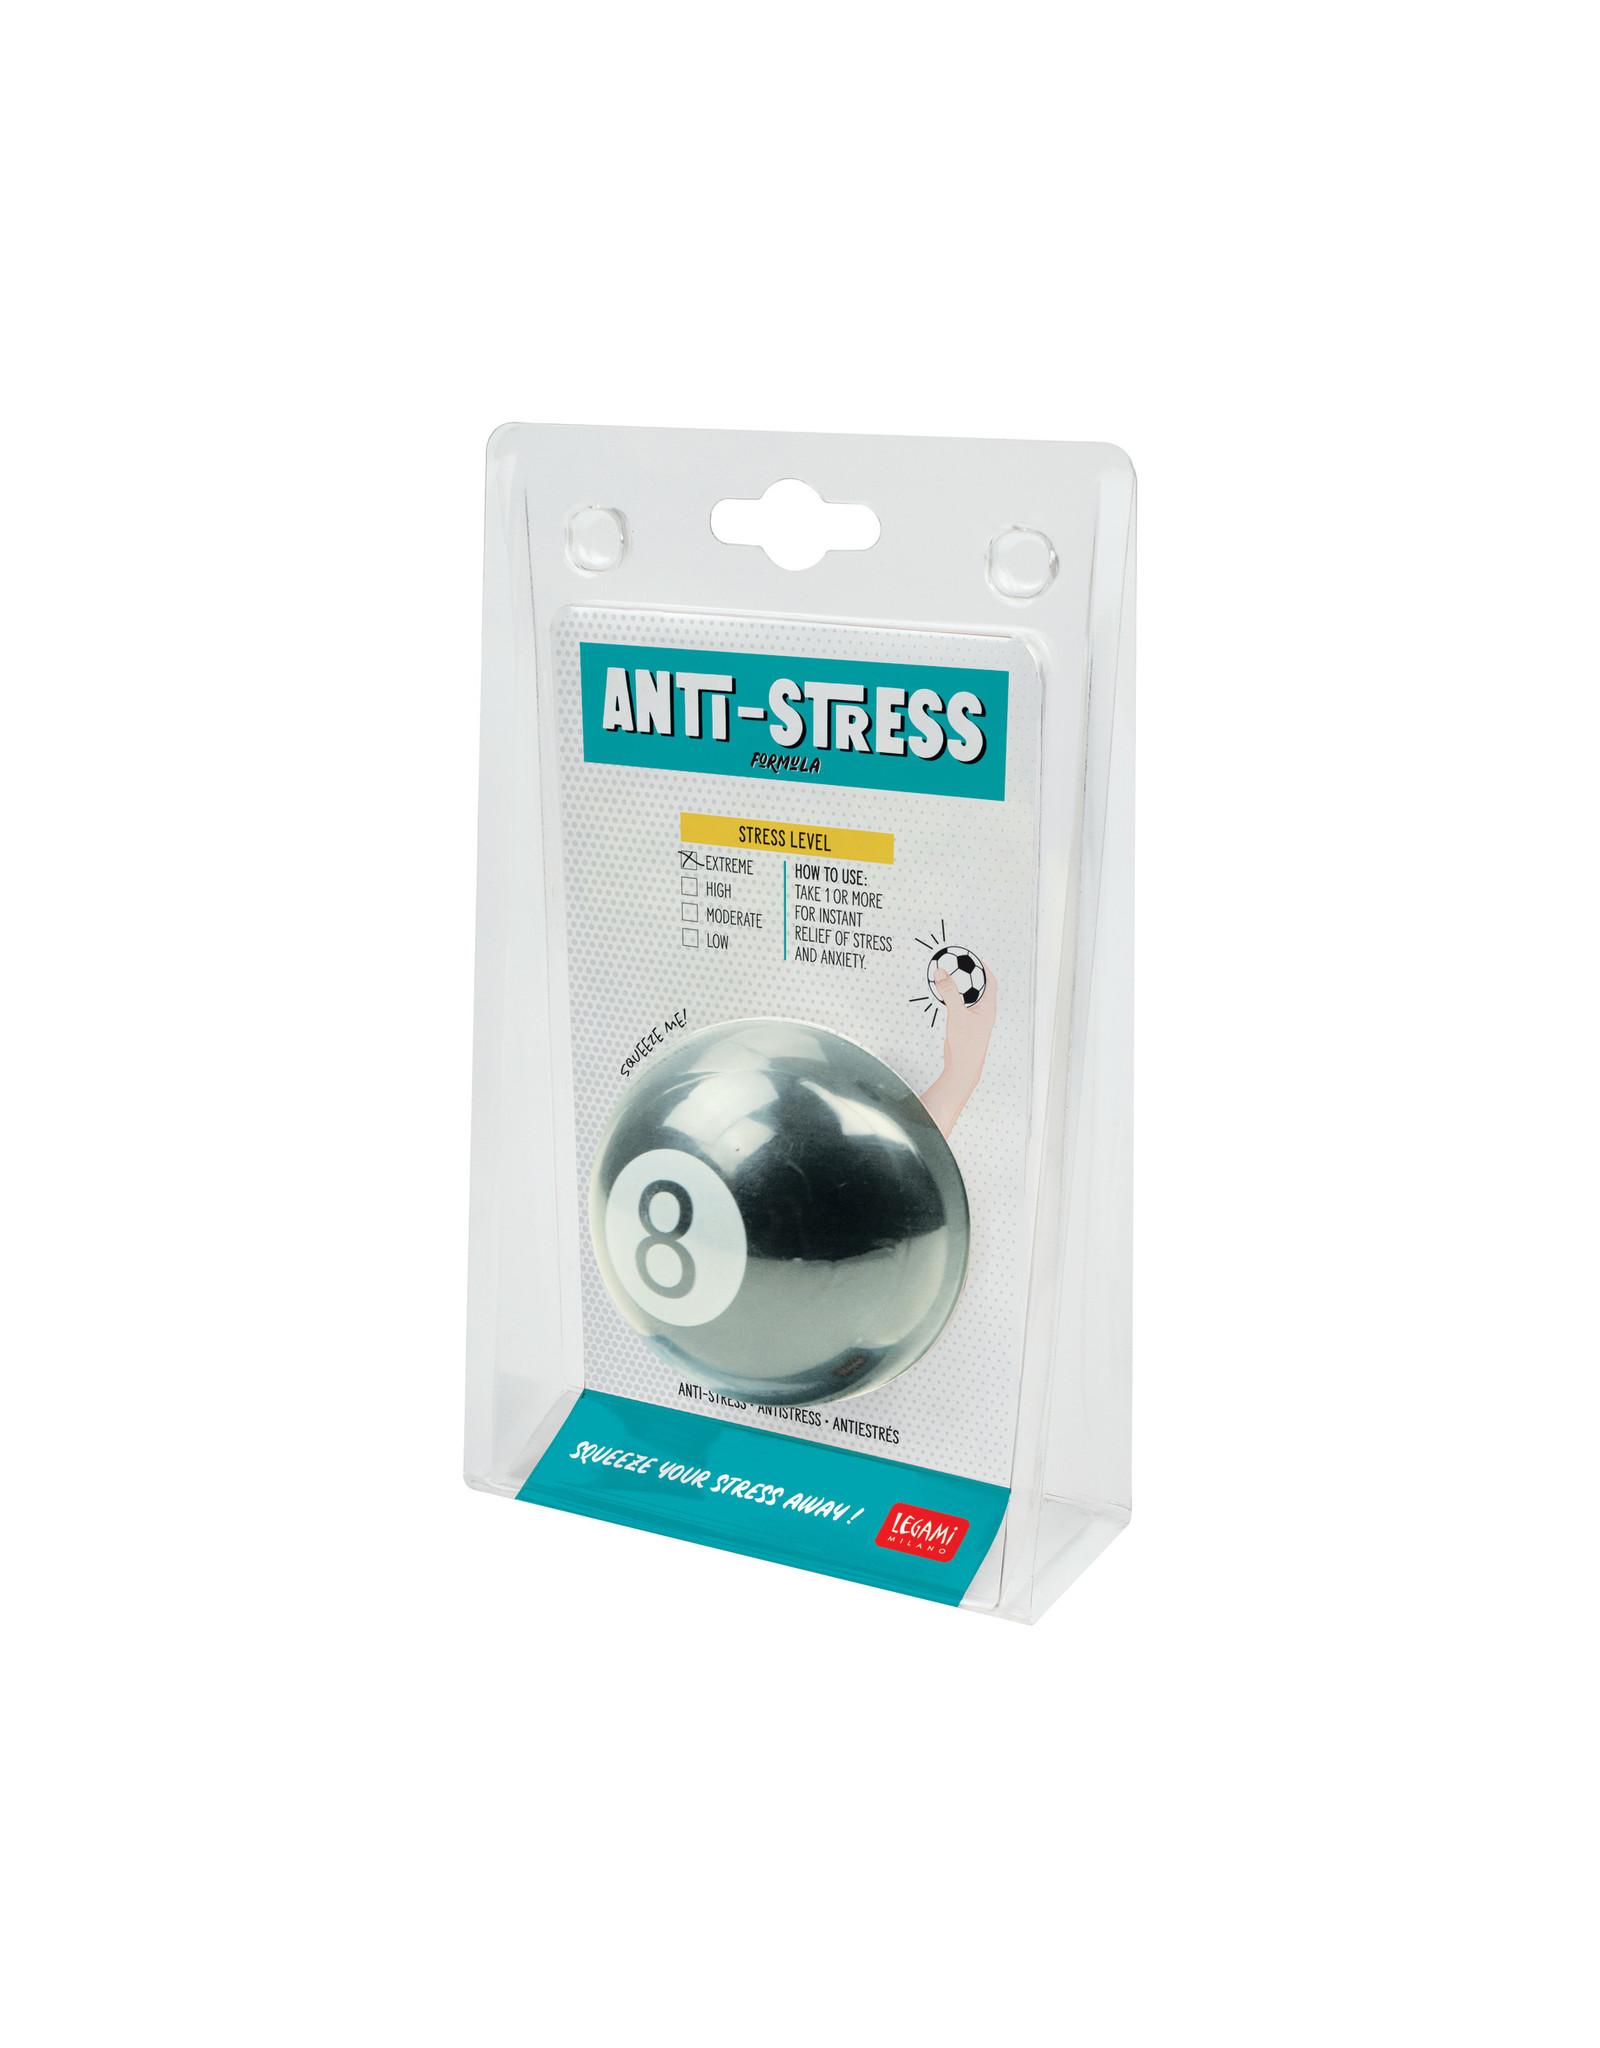 Legami stress ball - 8 ball